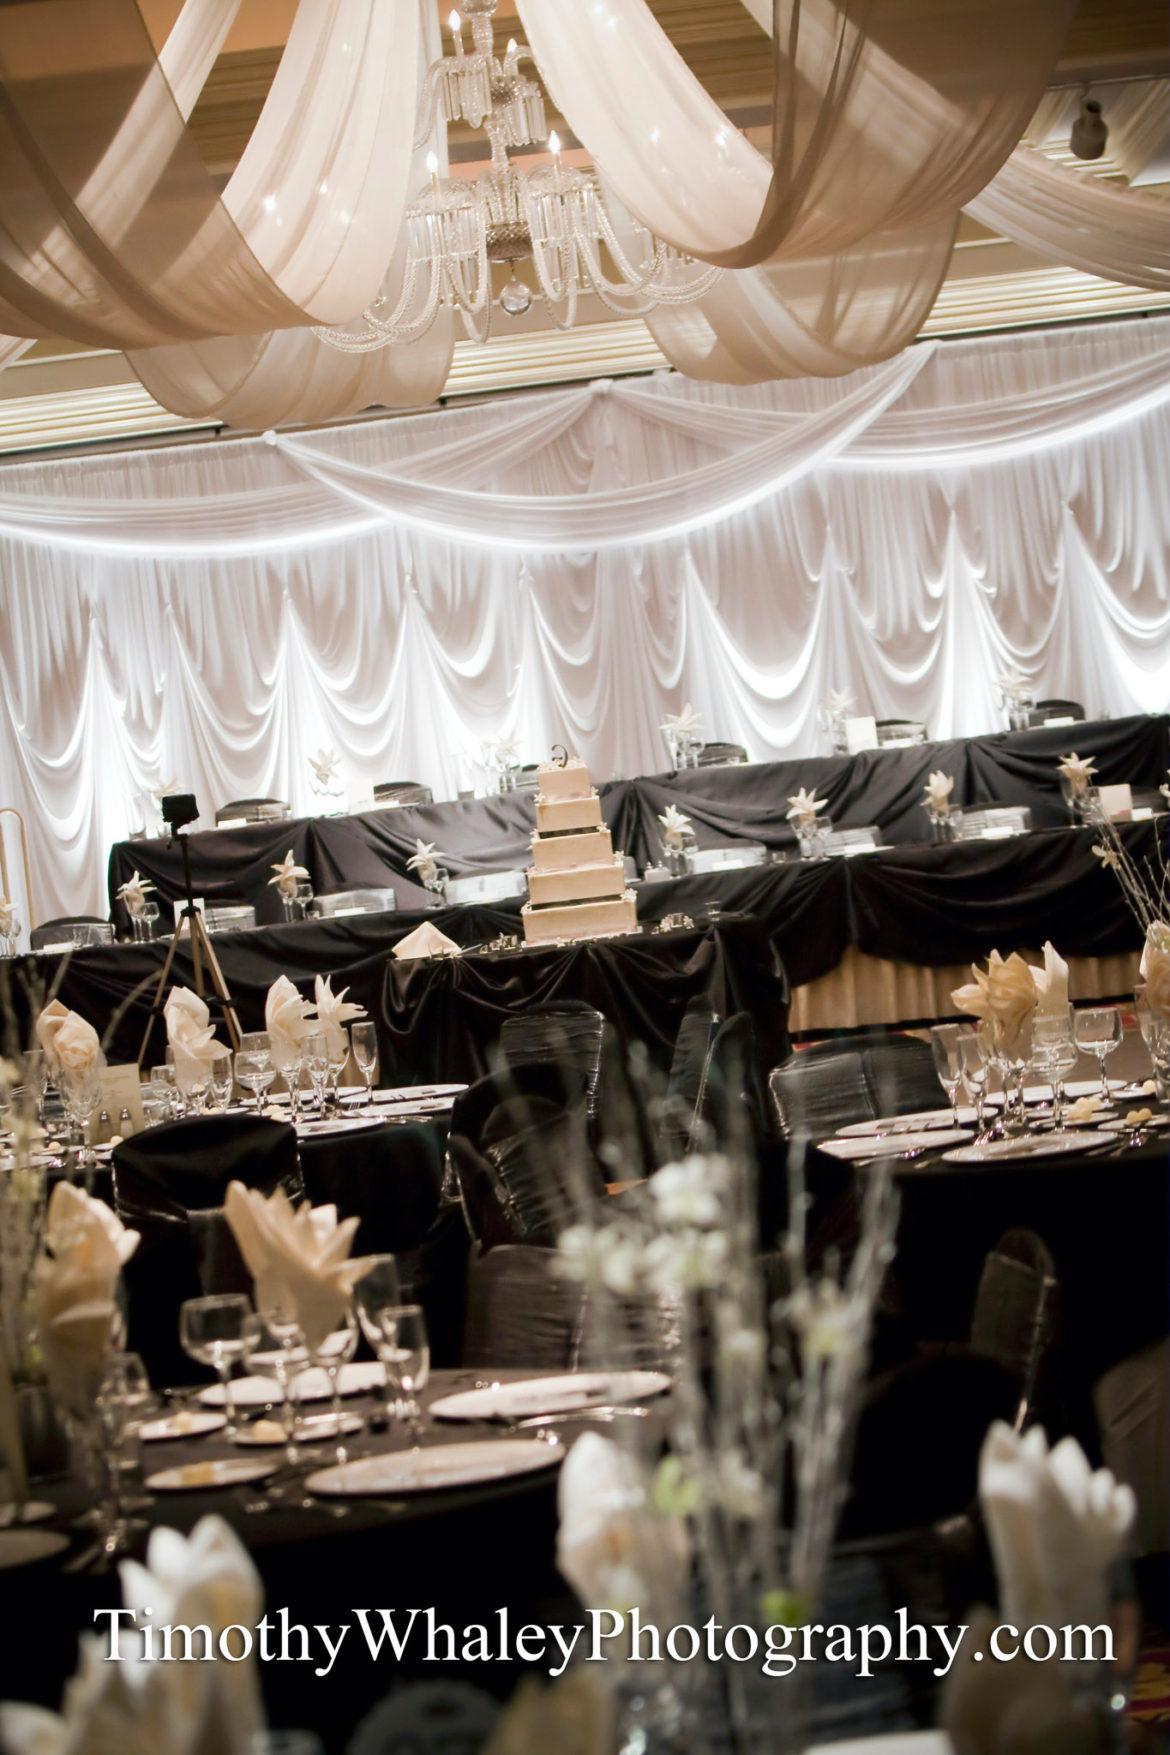 Elegant_Event_Lighting_Chicago_Bolingbrook_Golf_Club_Wedding_Draping_Backdrop_Soft_Uplighting